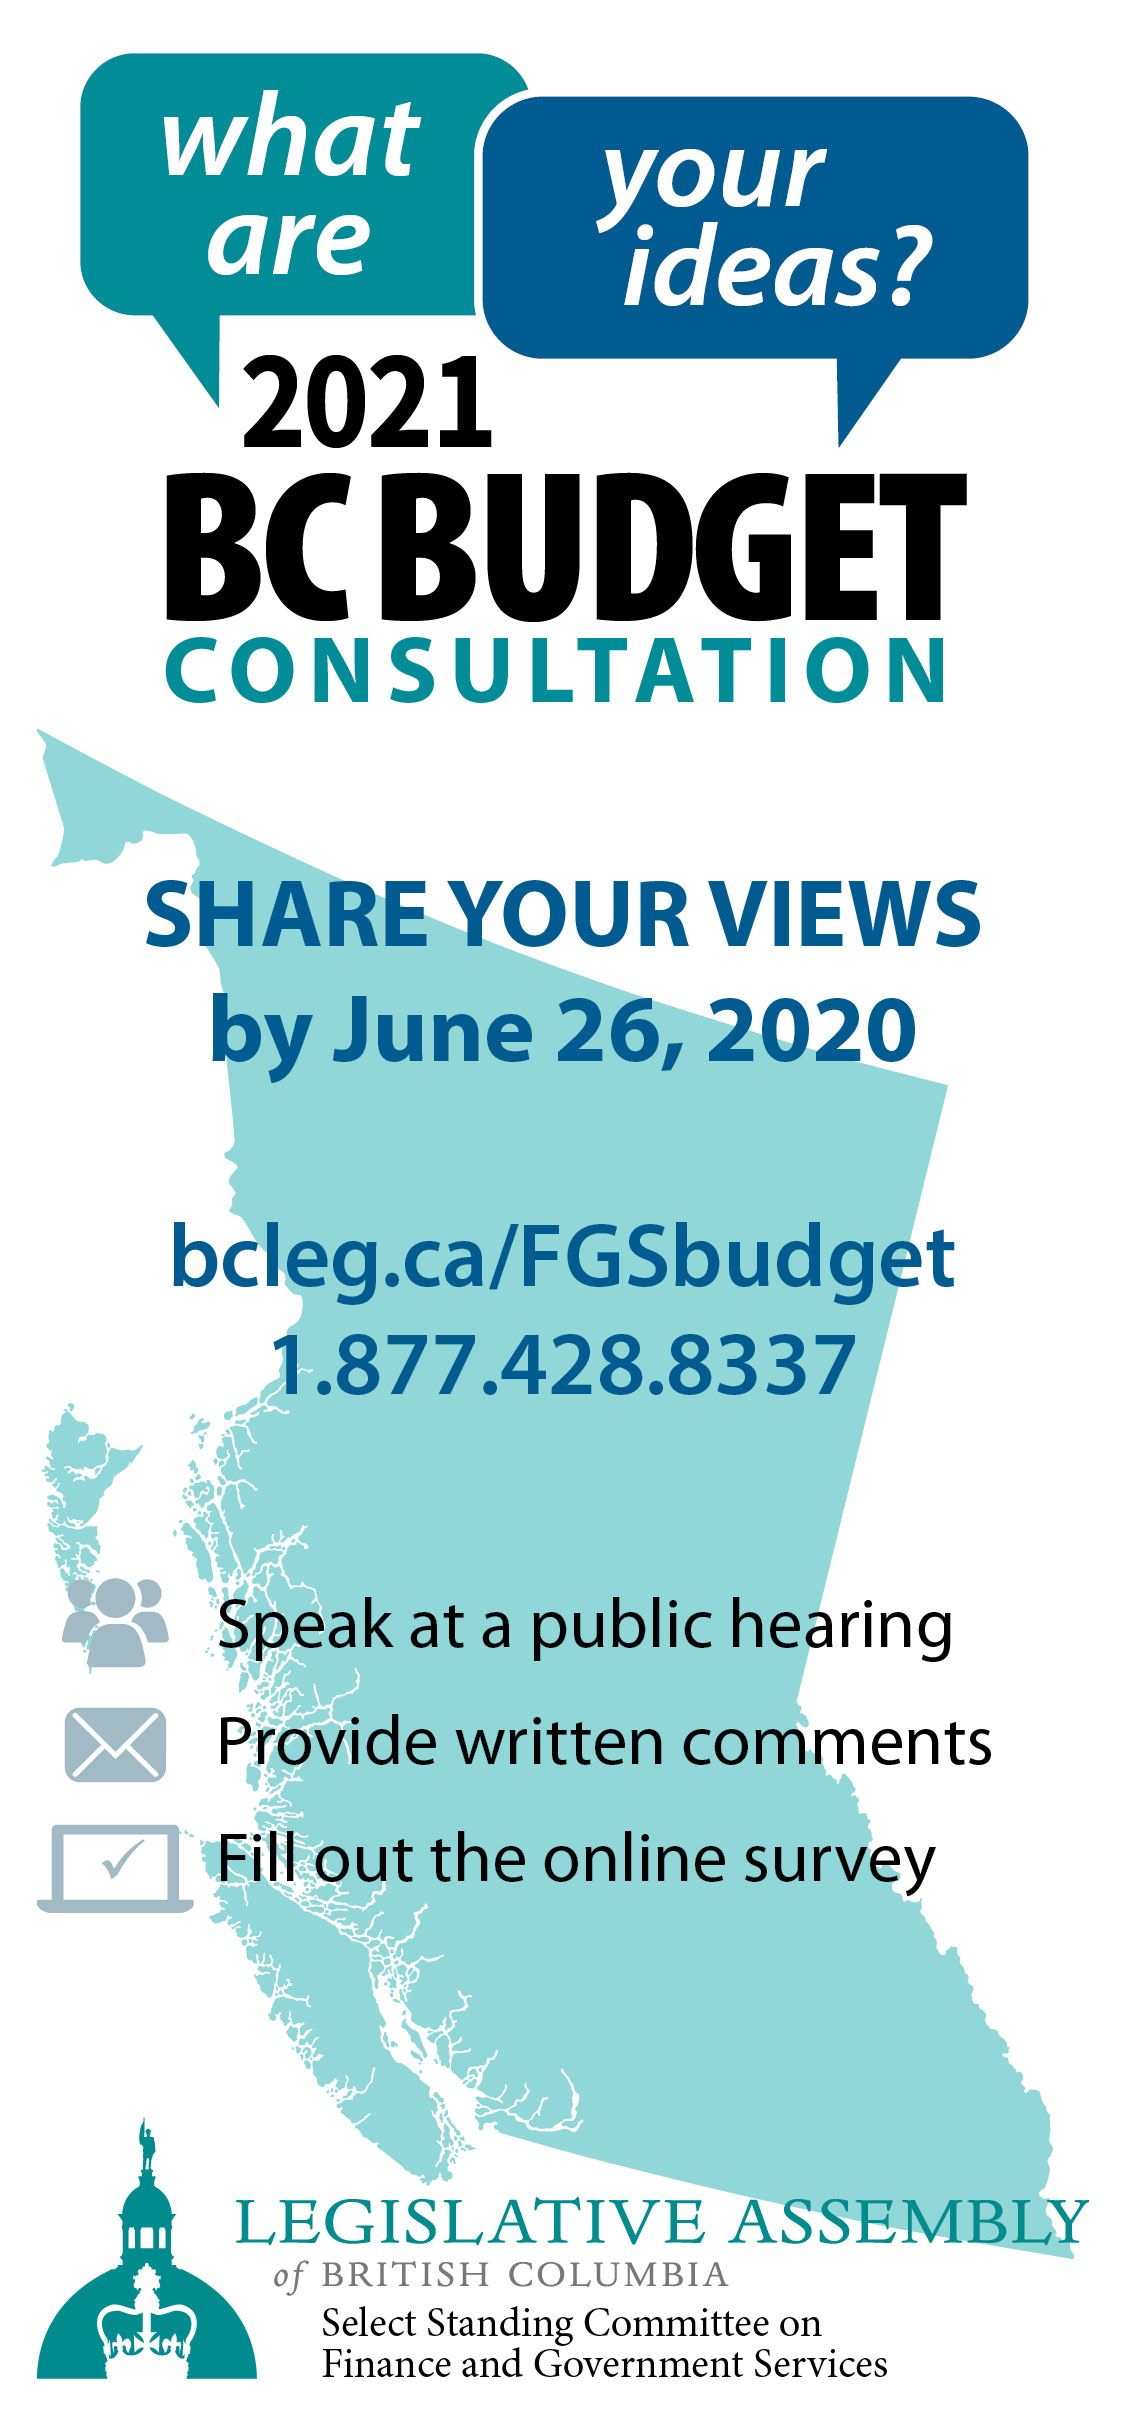 BC Budget 2021 Consultation